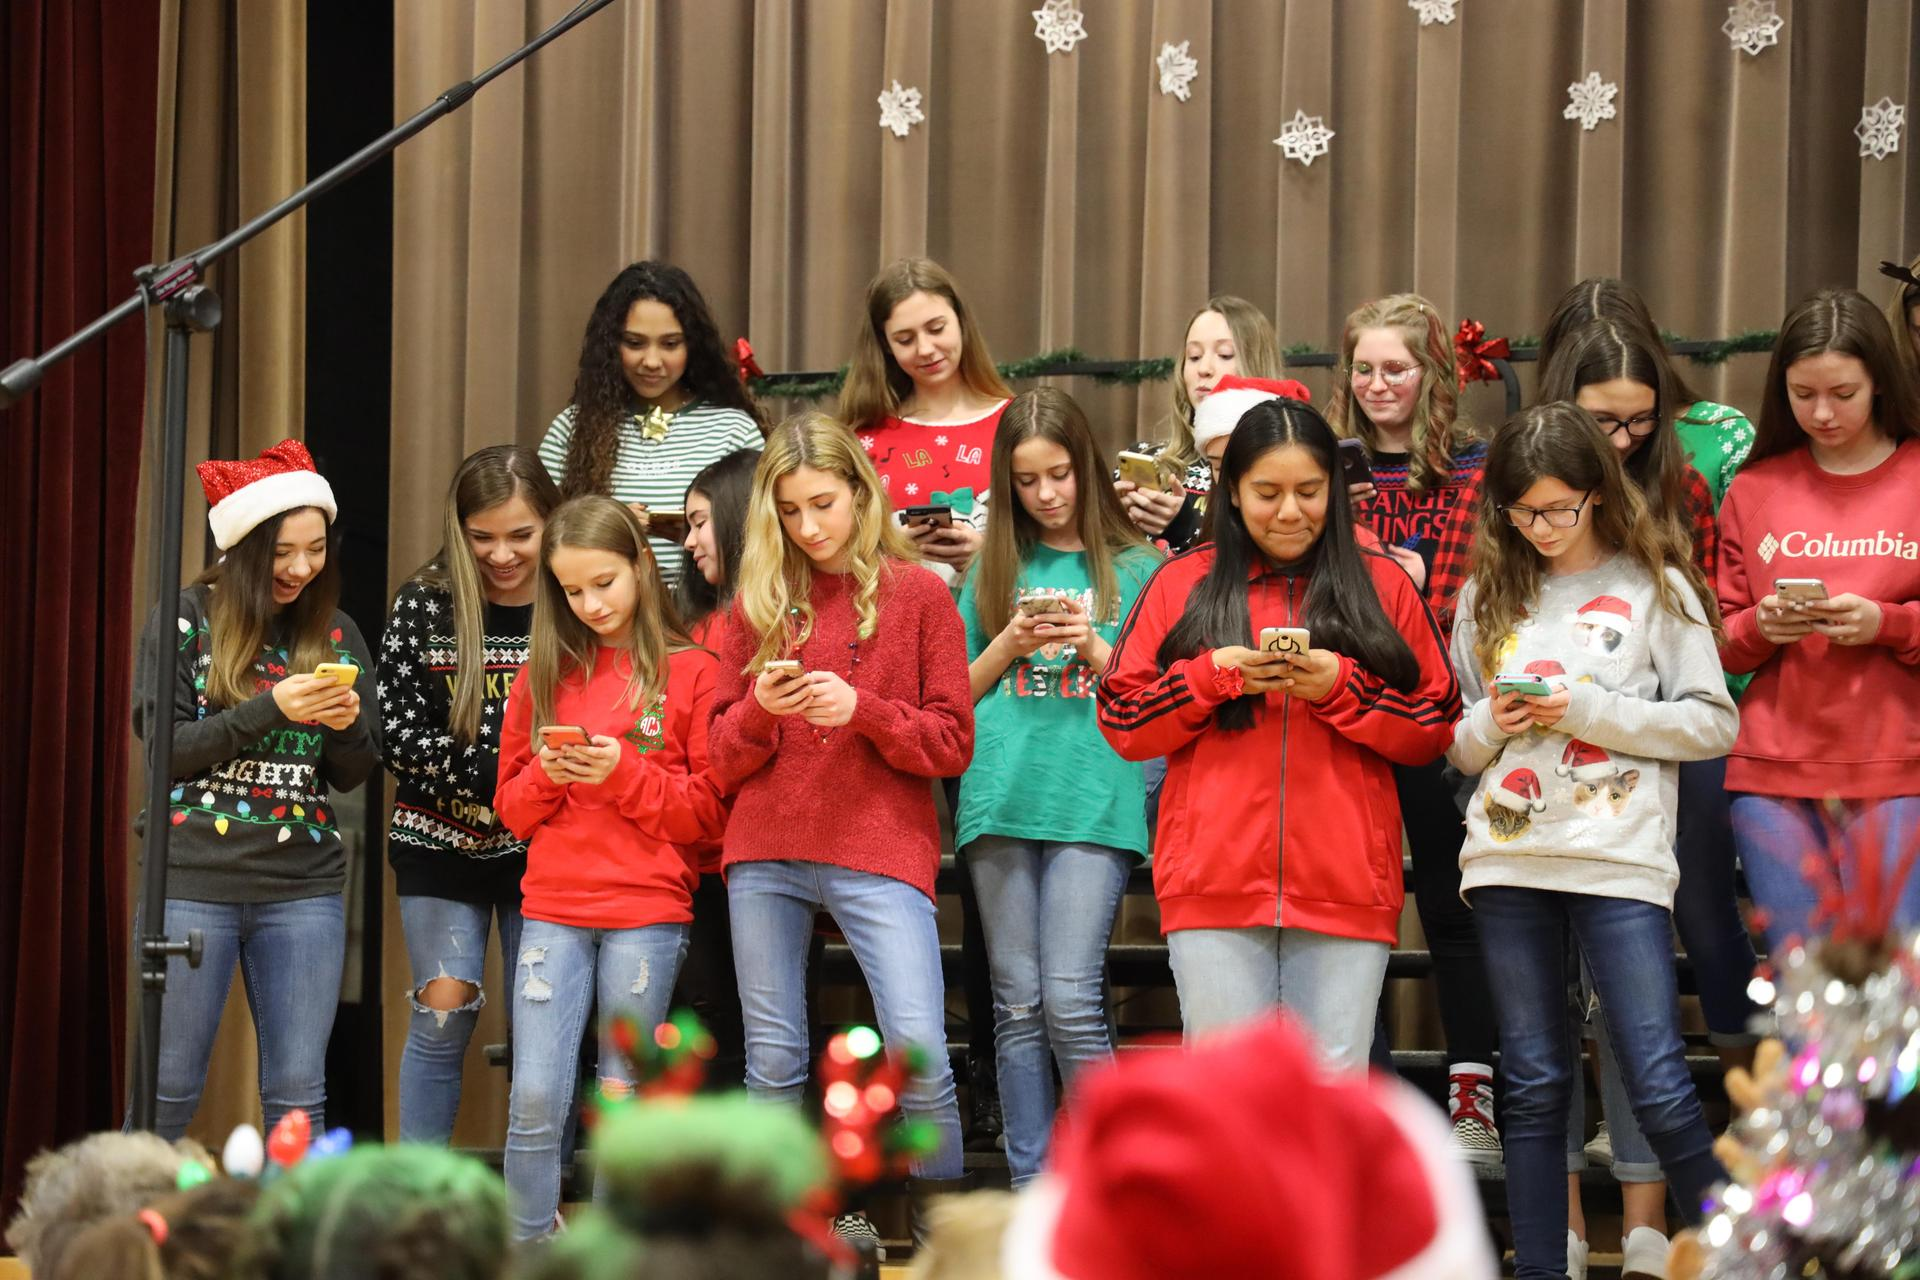 Fairmont Junior High fine arts students perform at Fairmont ElementaryFairmont Junior High fine arts students perform at Fairmont Elementary